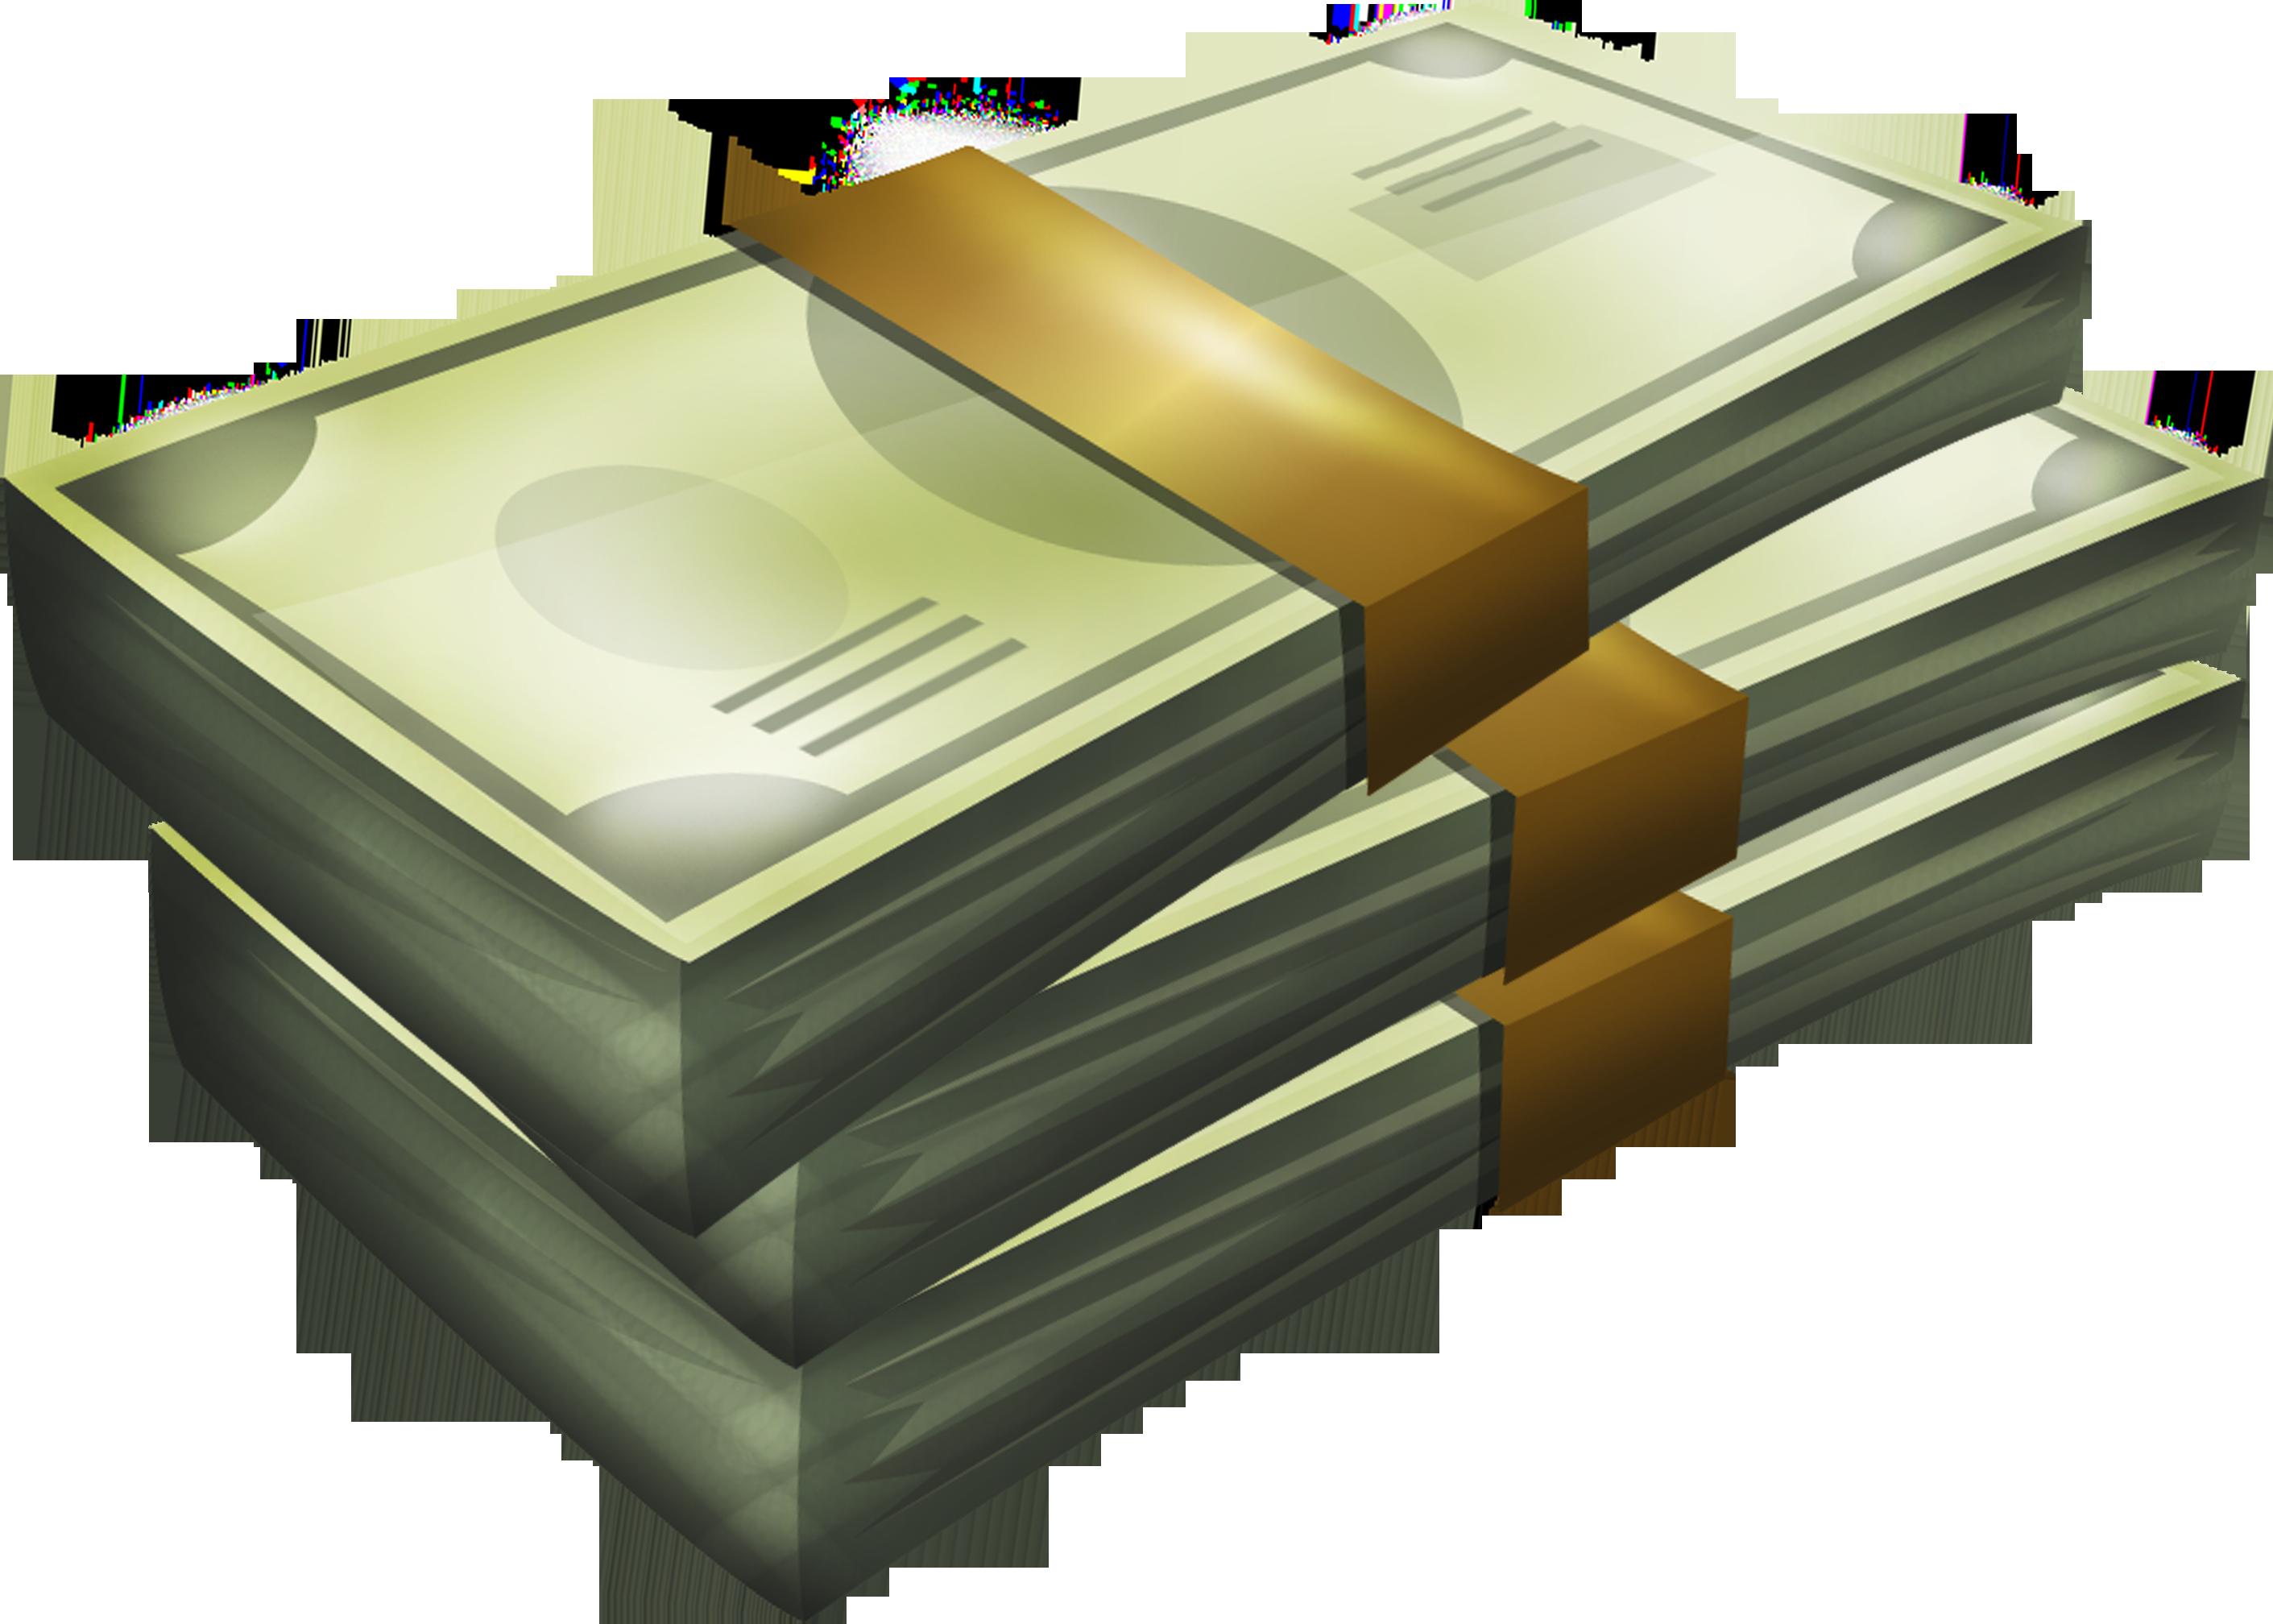 Money stack clipart transparent jpg transparent stock money stacks png www pixshark images galleries - interested in 1 500 ... jpg transparent stock